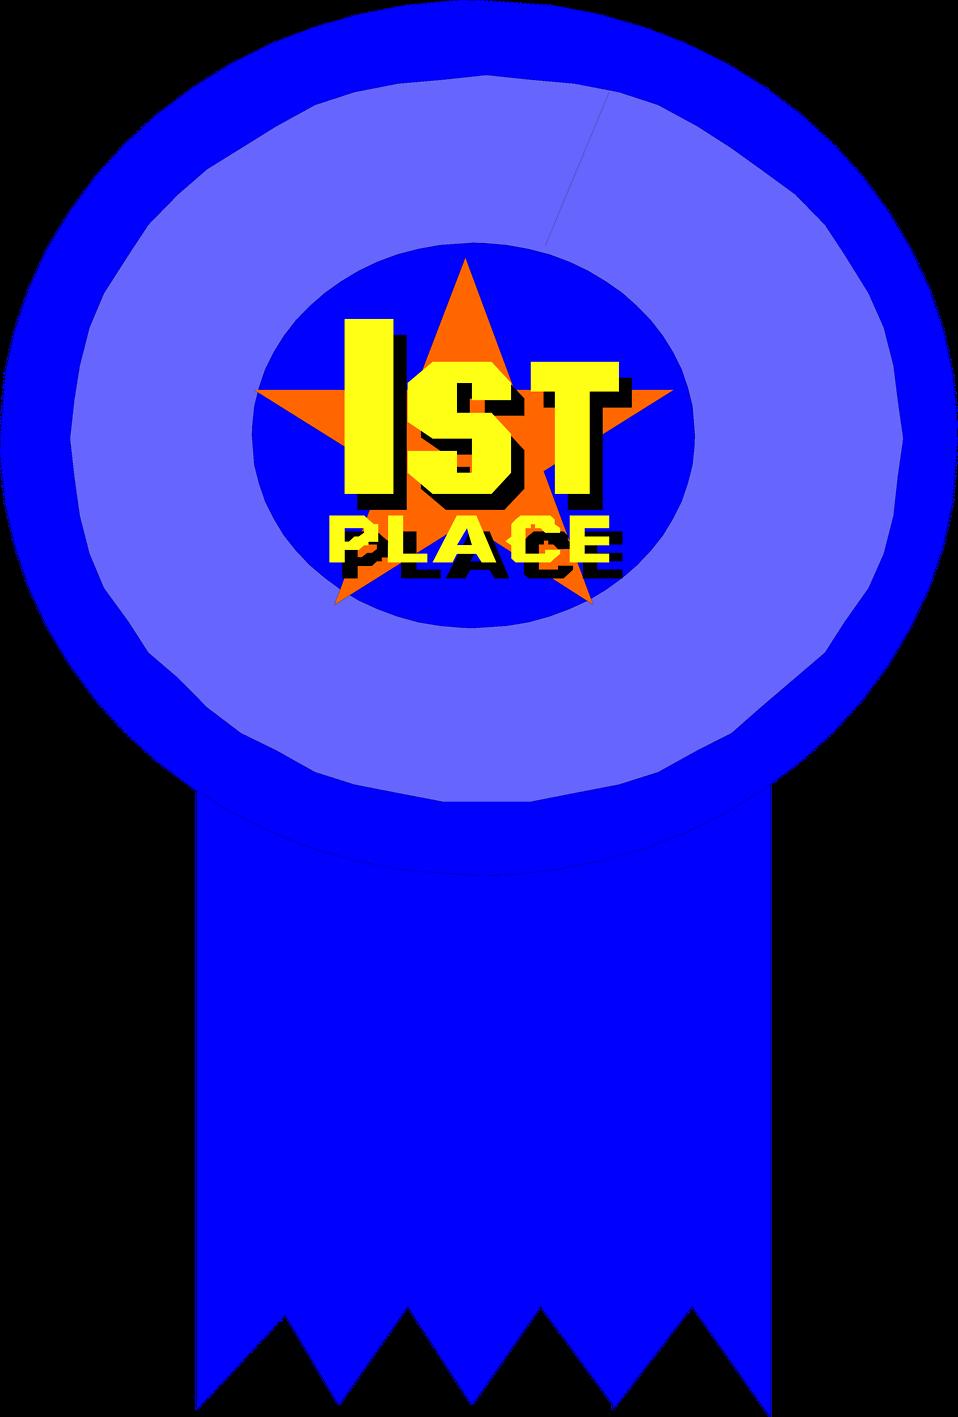 1st place award ribbon clipart